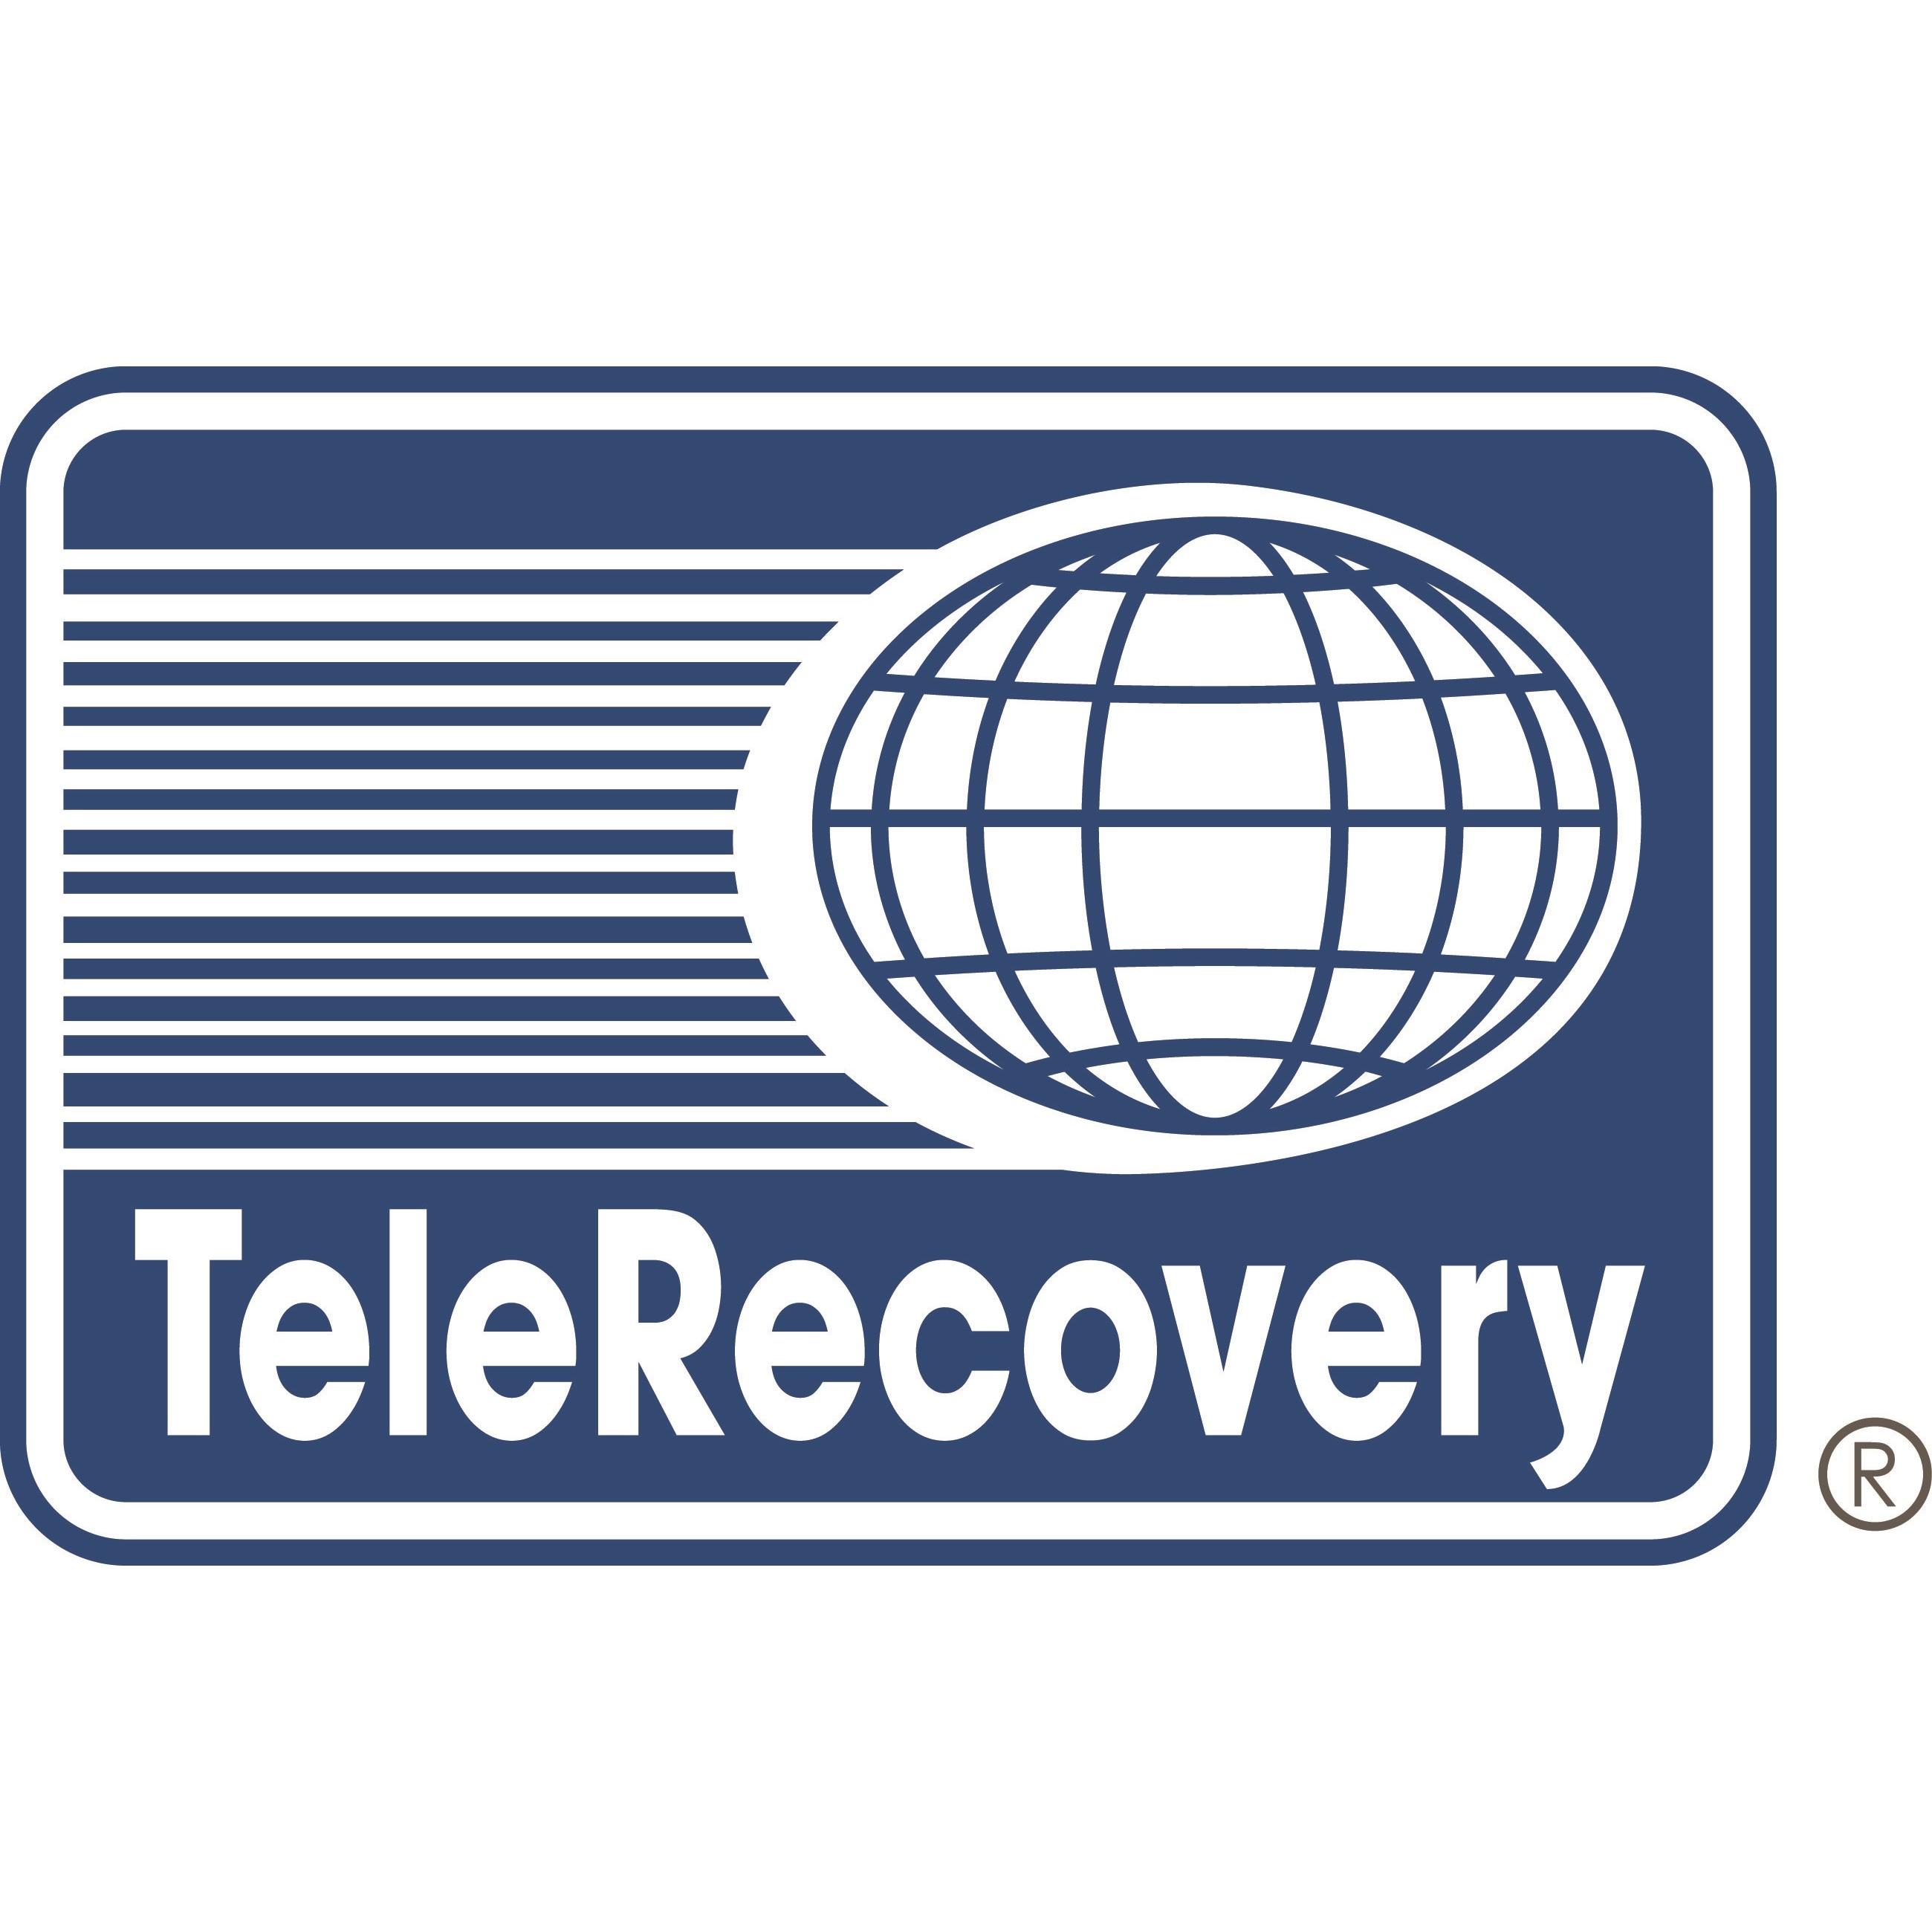 TeleRecovery image 5